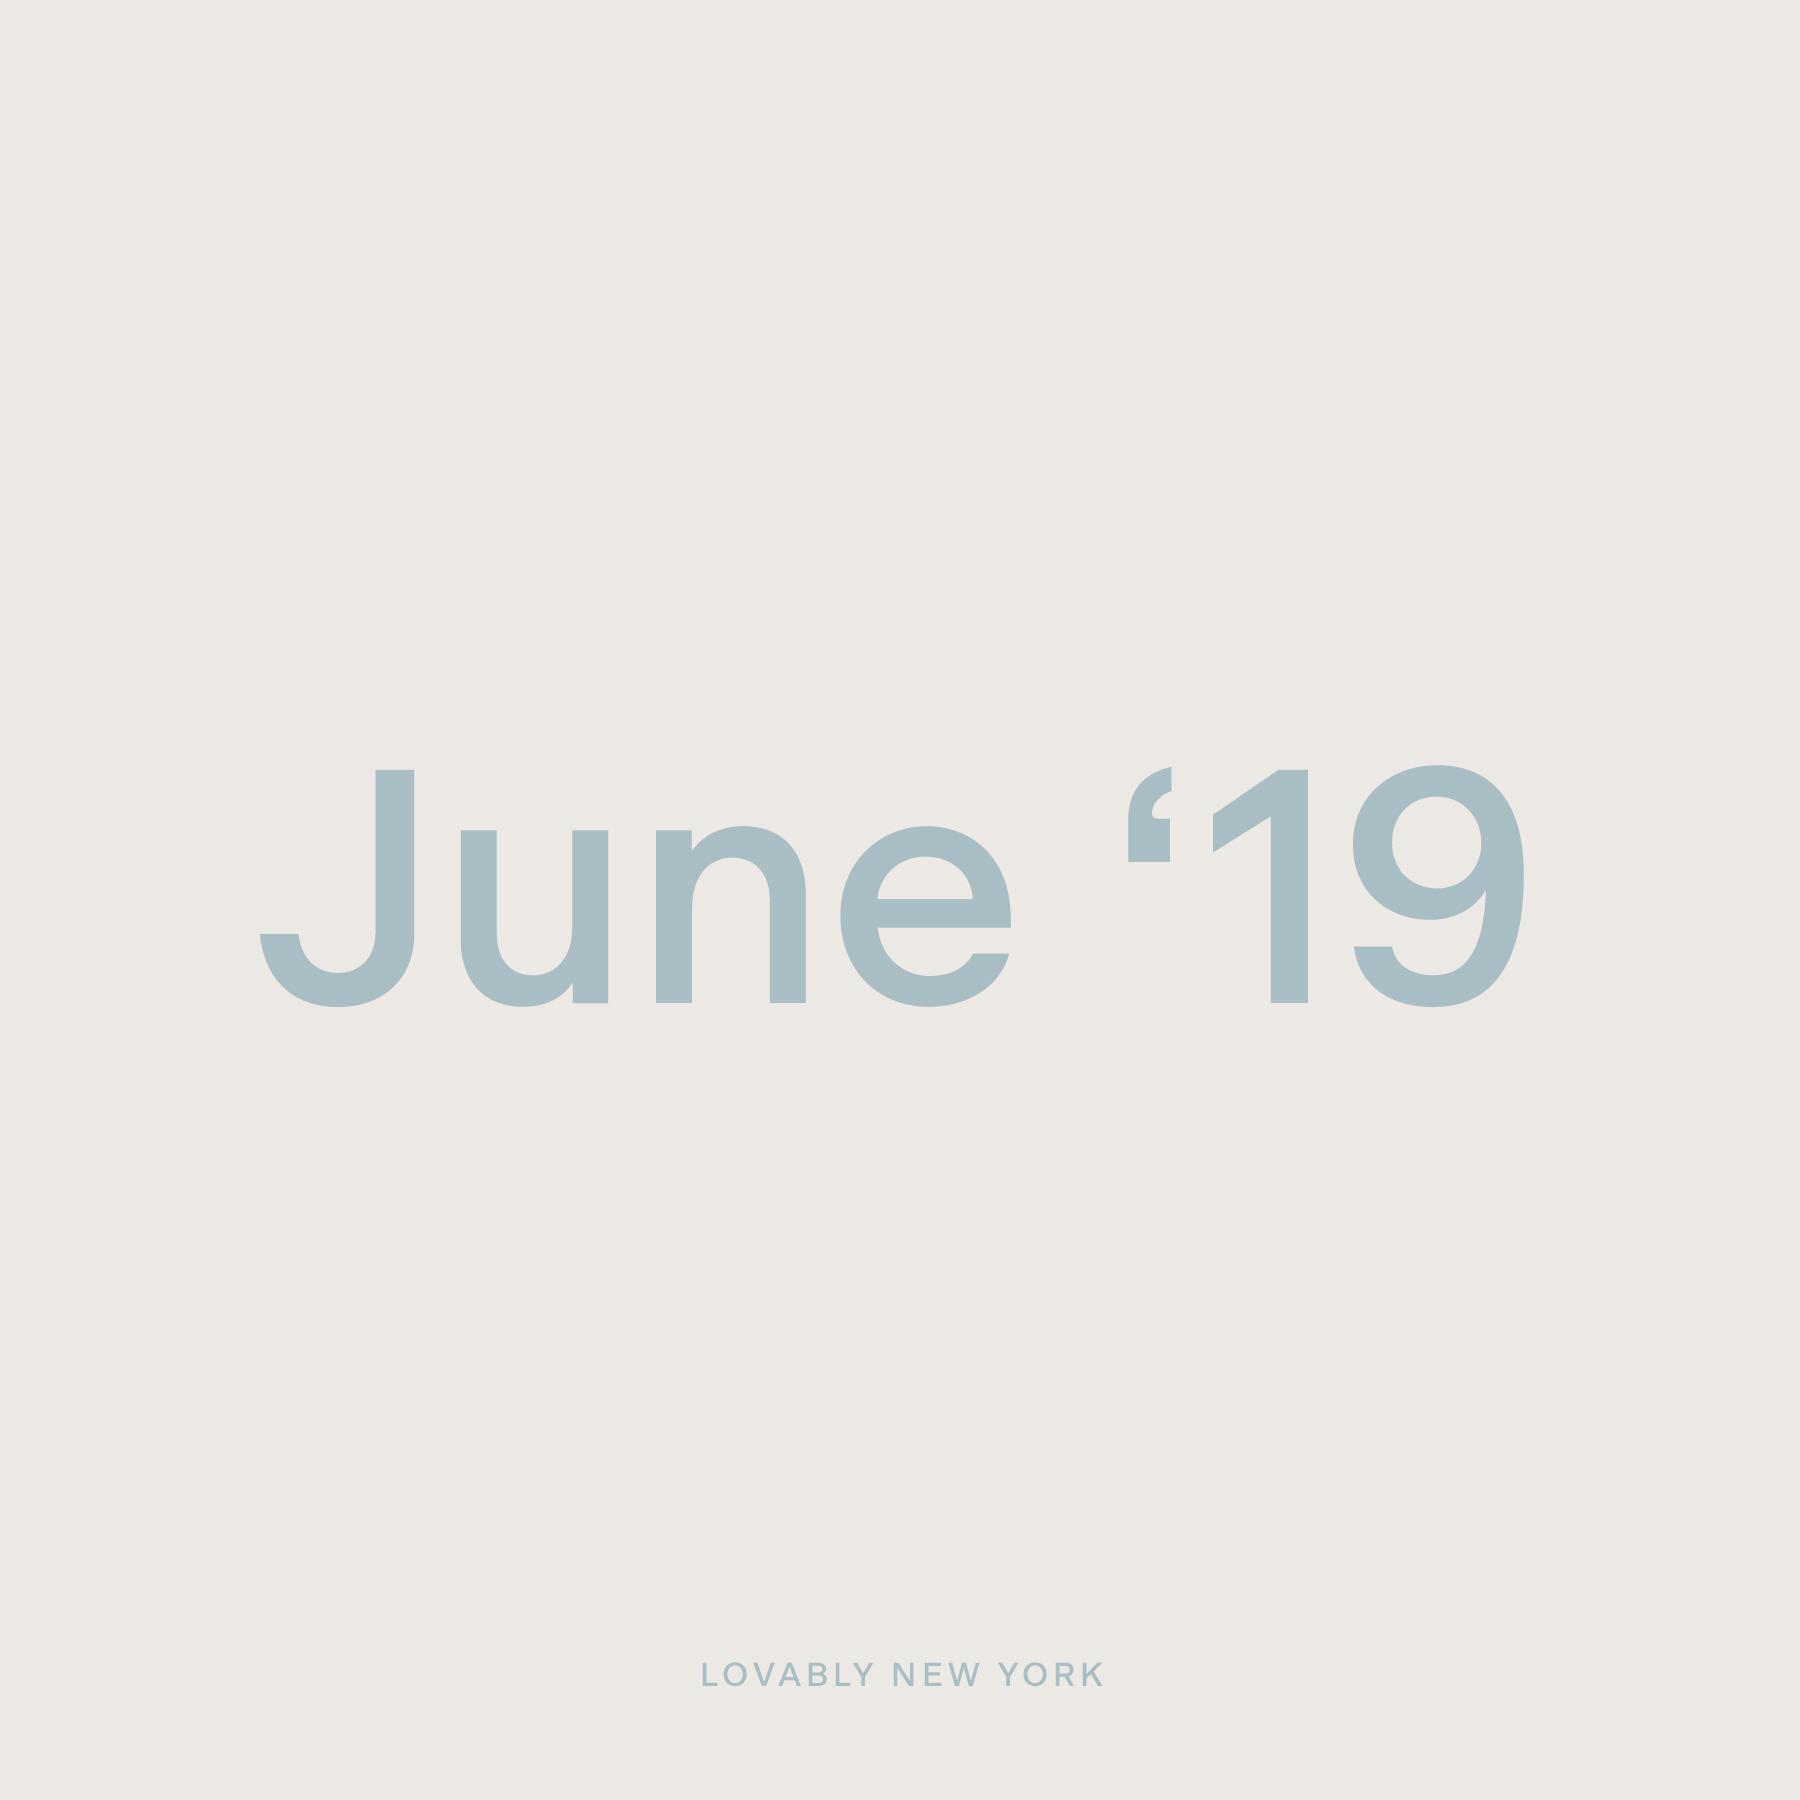 June '19